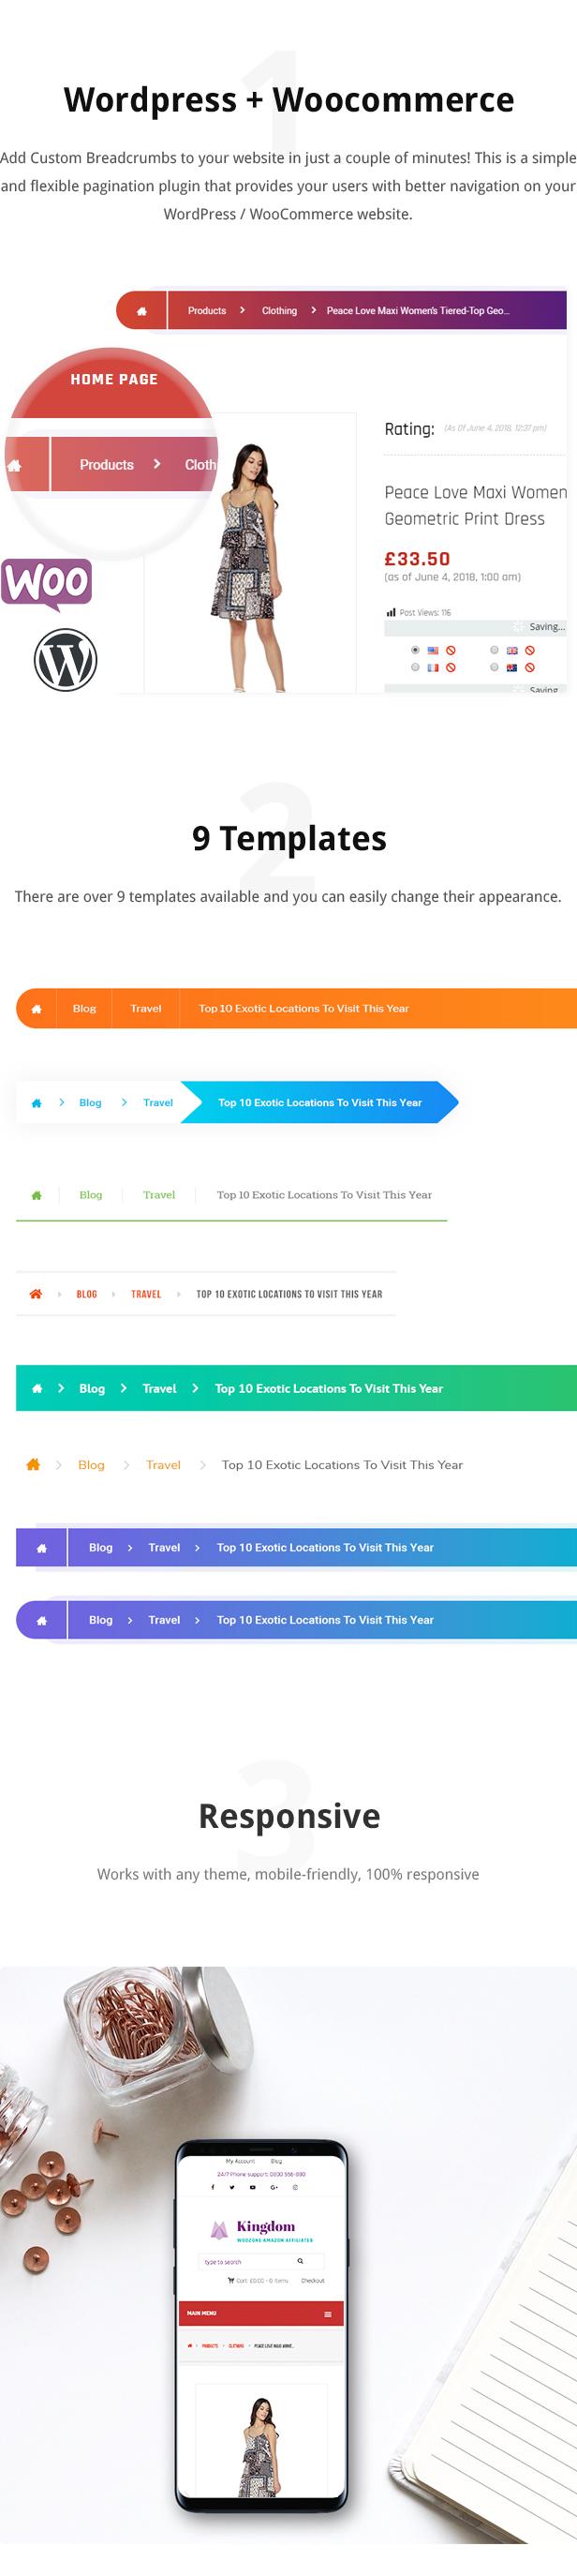 Wordpress / WooCommerce Custom Breadcrumbs Plugin - 1